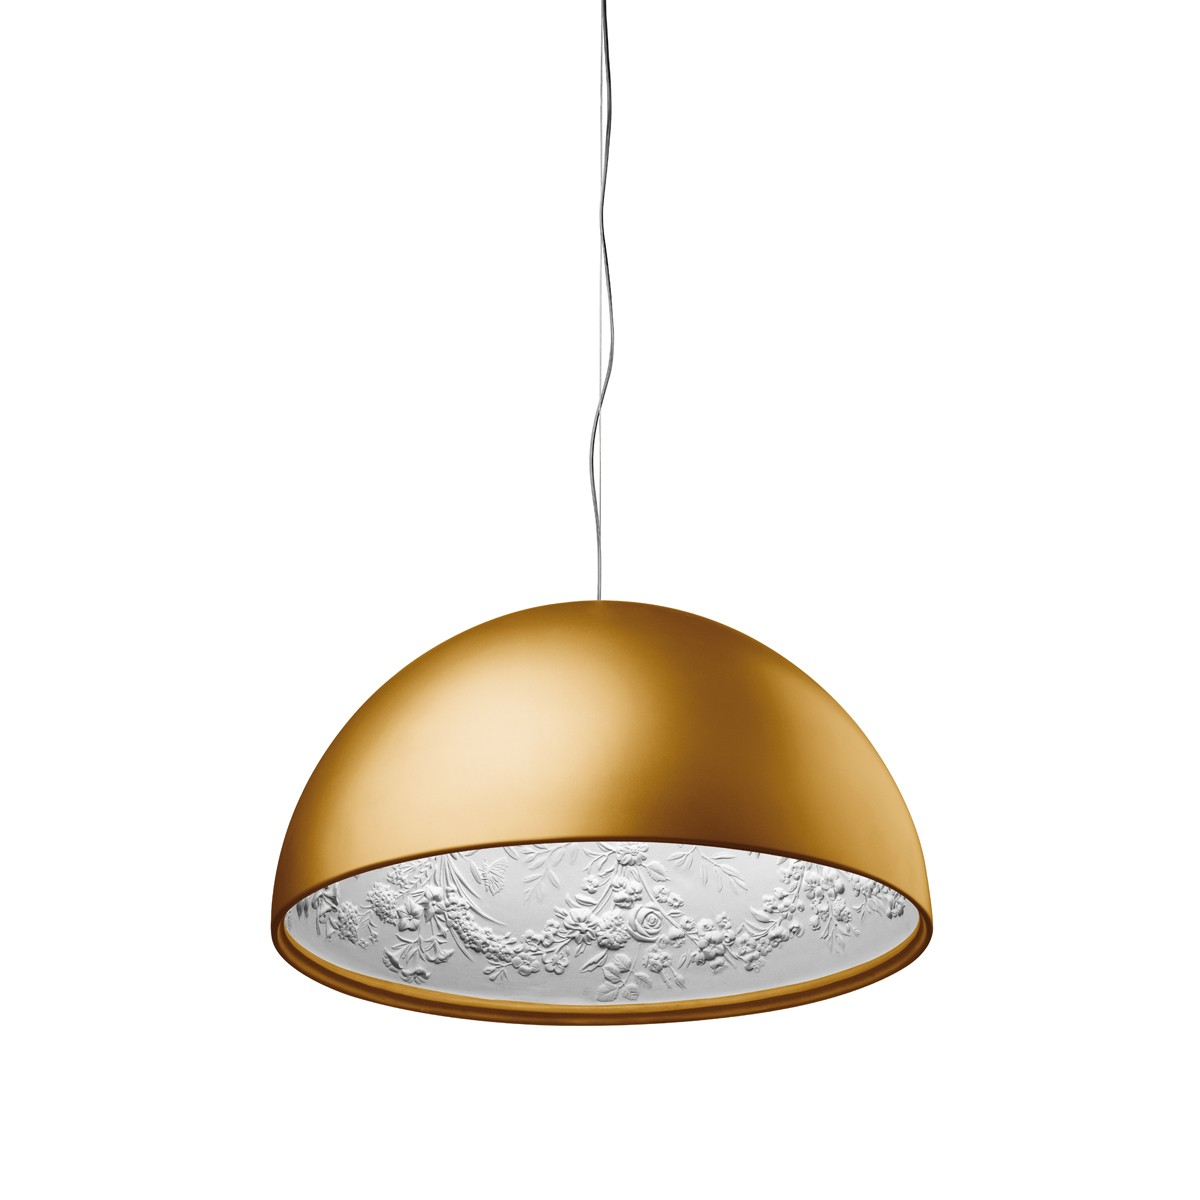 Flos Skygarden Pendelleuchte, Ø: 60 cm, Gold matt